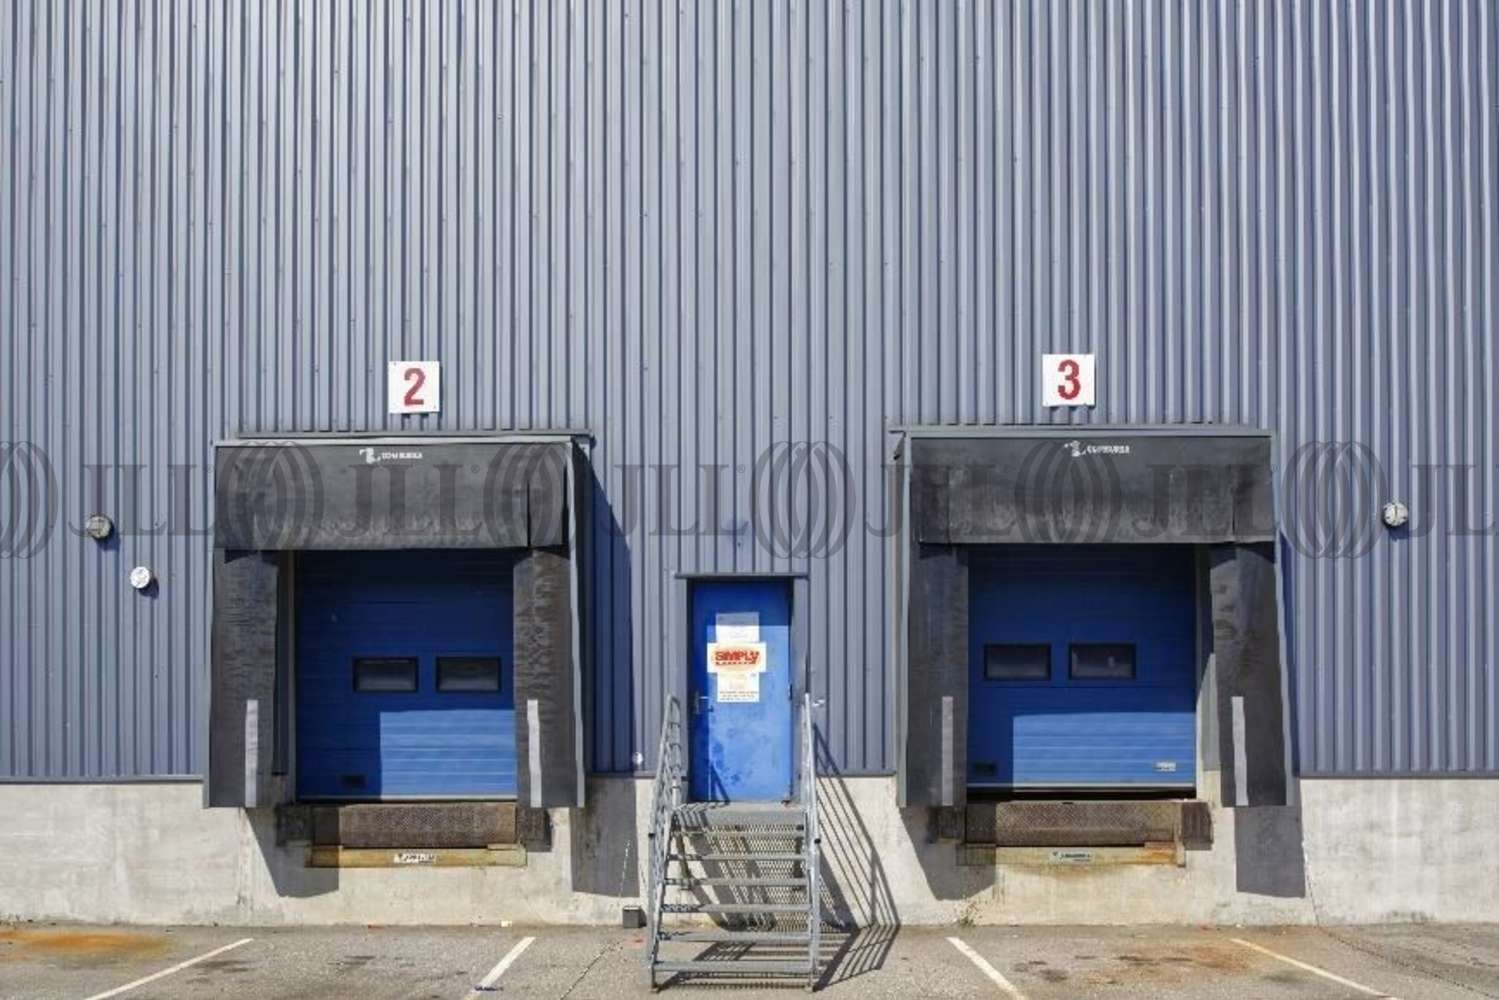 Plateformes logistiques St germain les arpajon, 91180 -  RUE HELENE BOUCHER